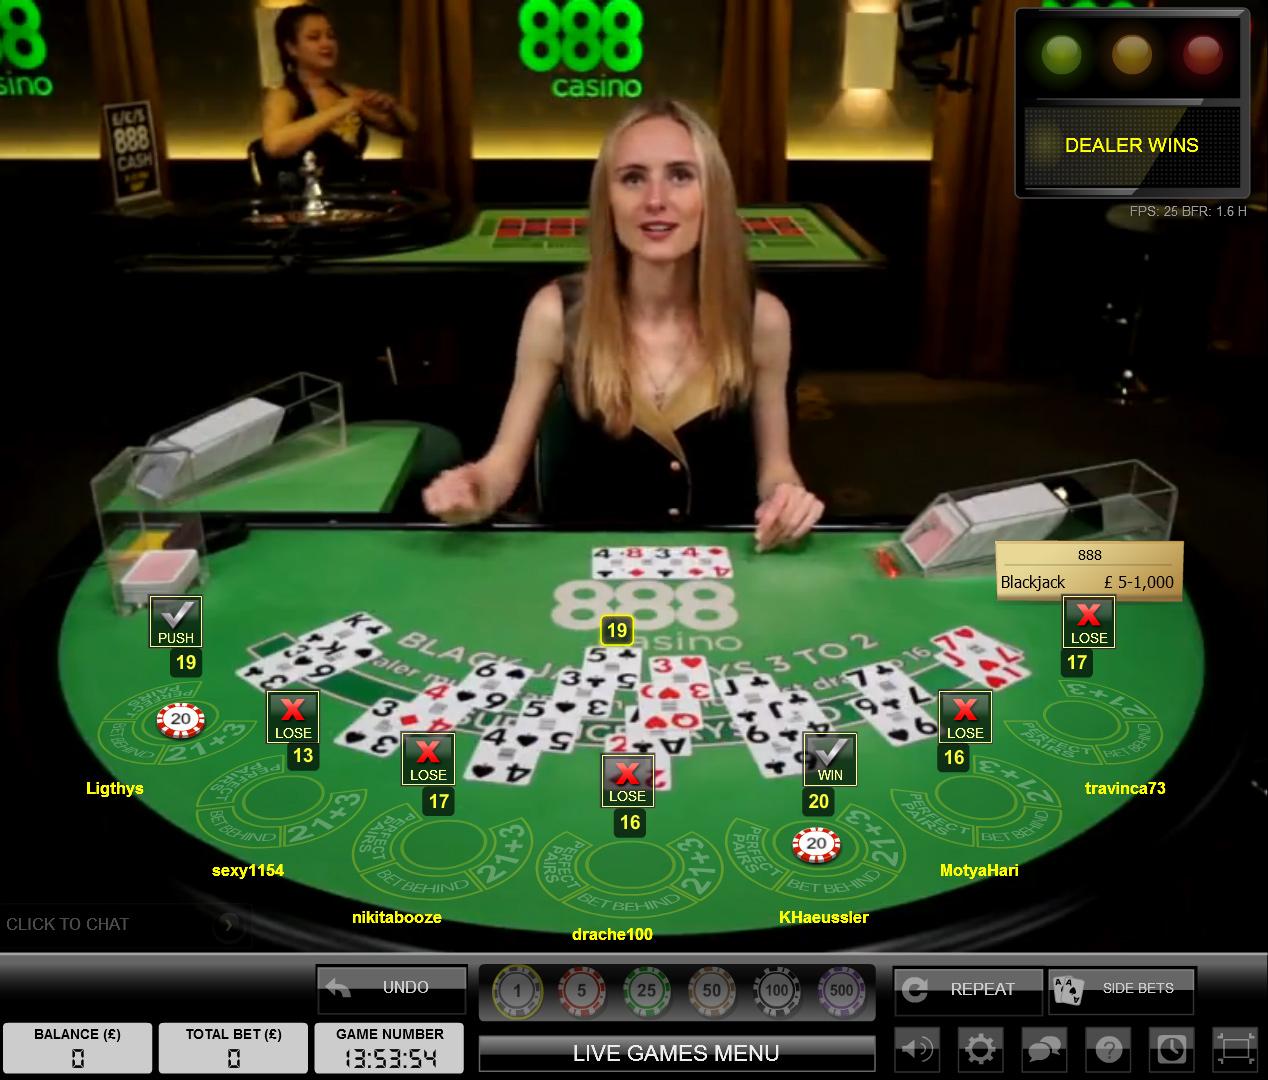 cum sa faci bani rapid live casino